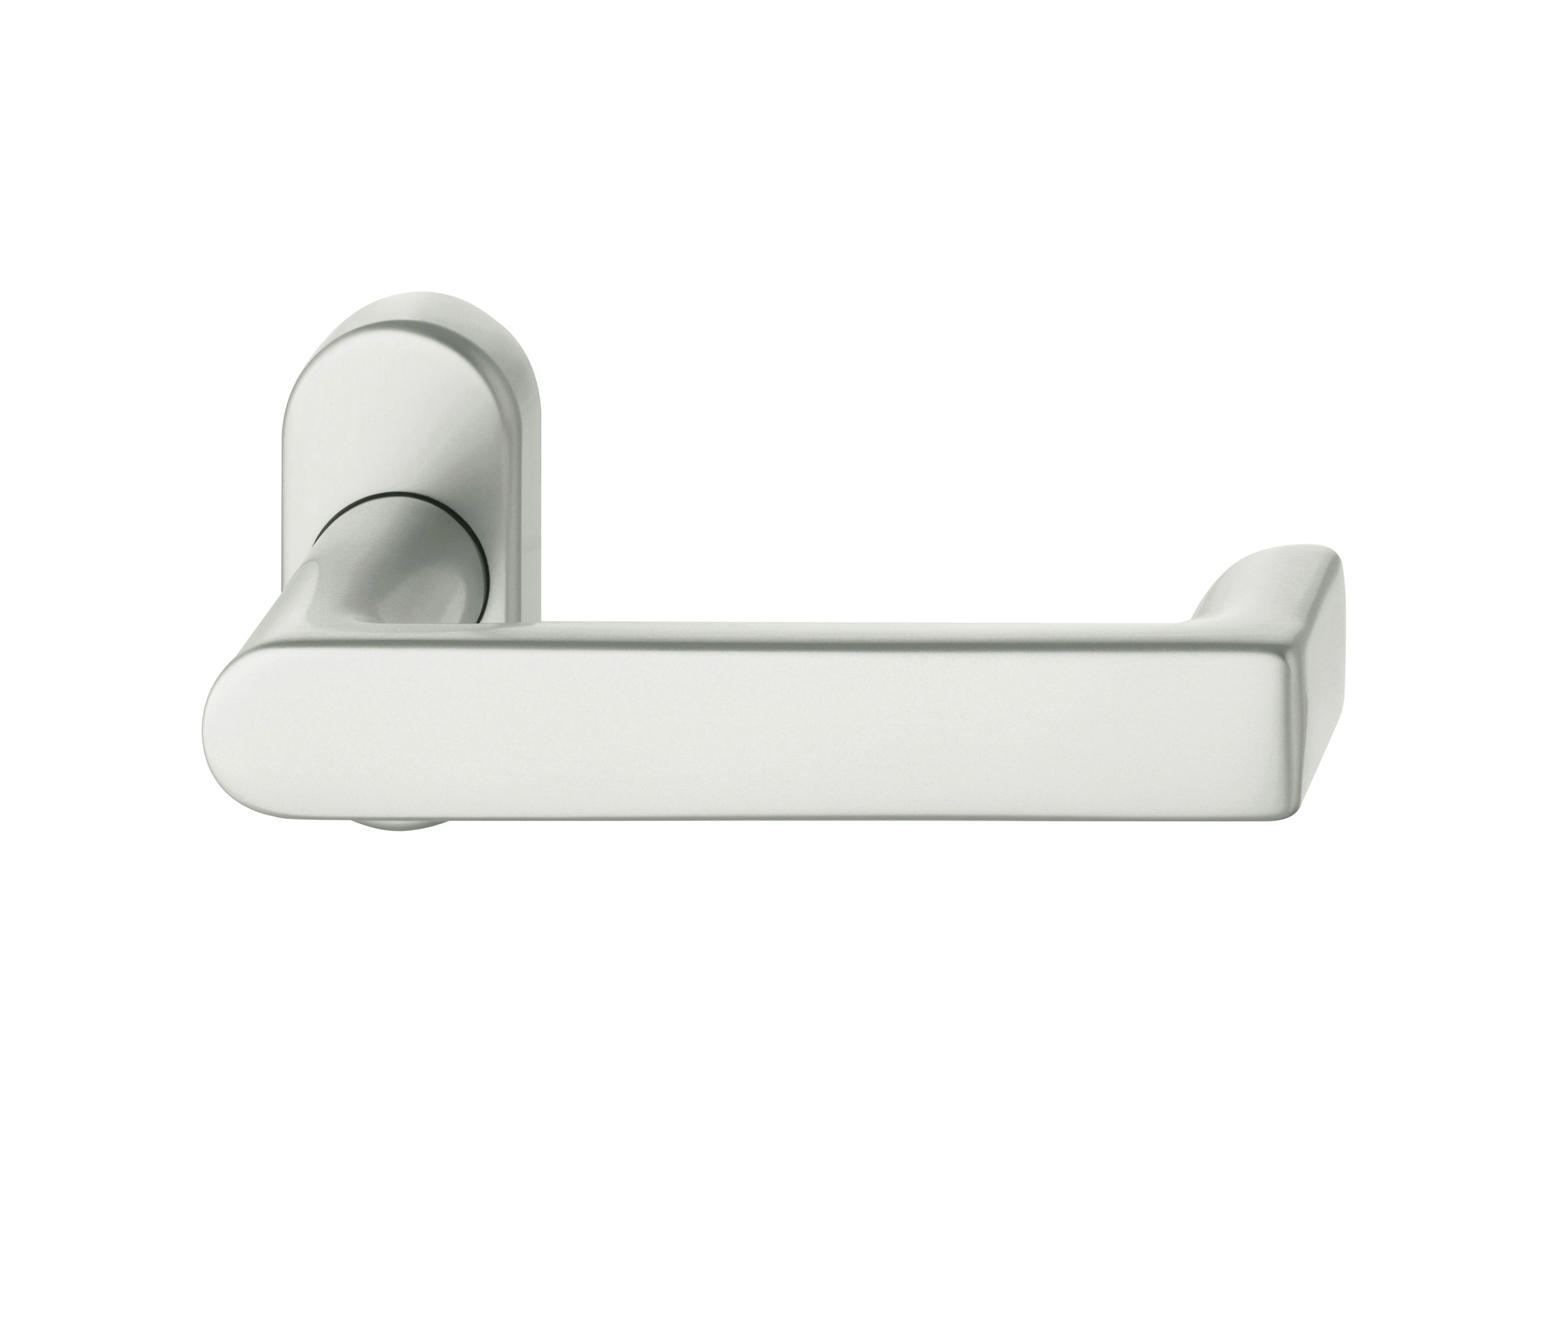 fsb 09 1244 frame door handle lever handles from fsb. Black Bedroom Furniture Sets. Home Design Ideas